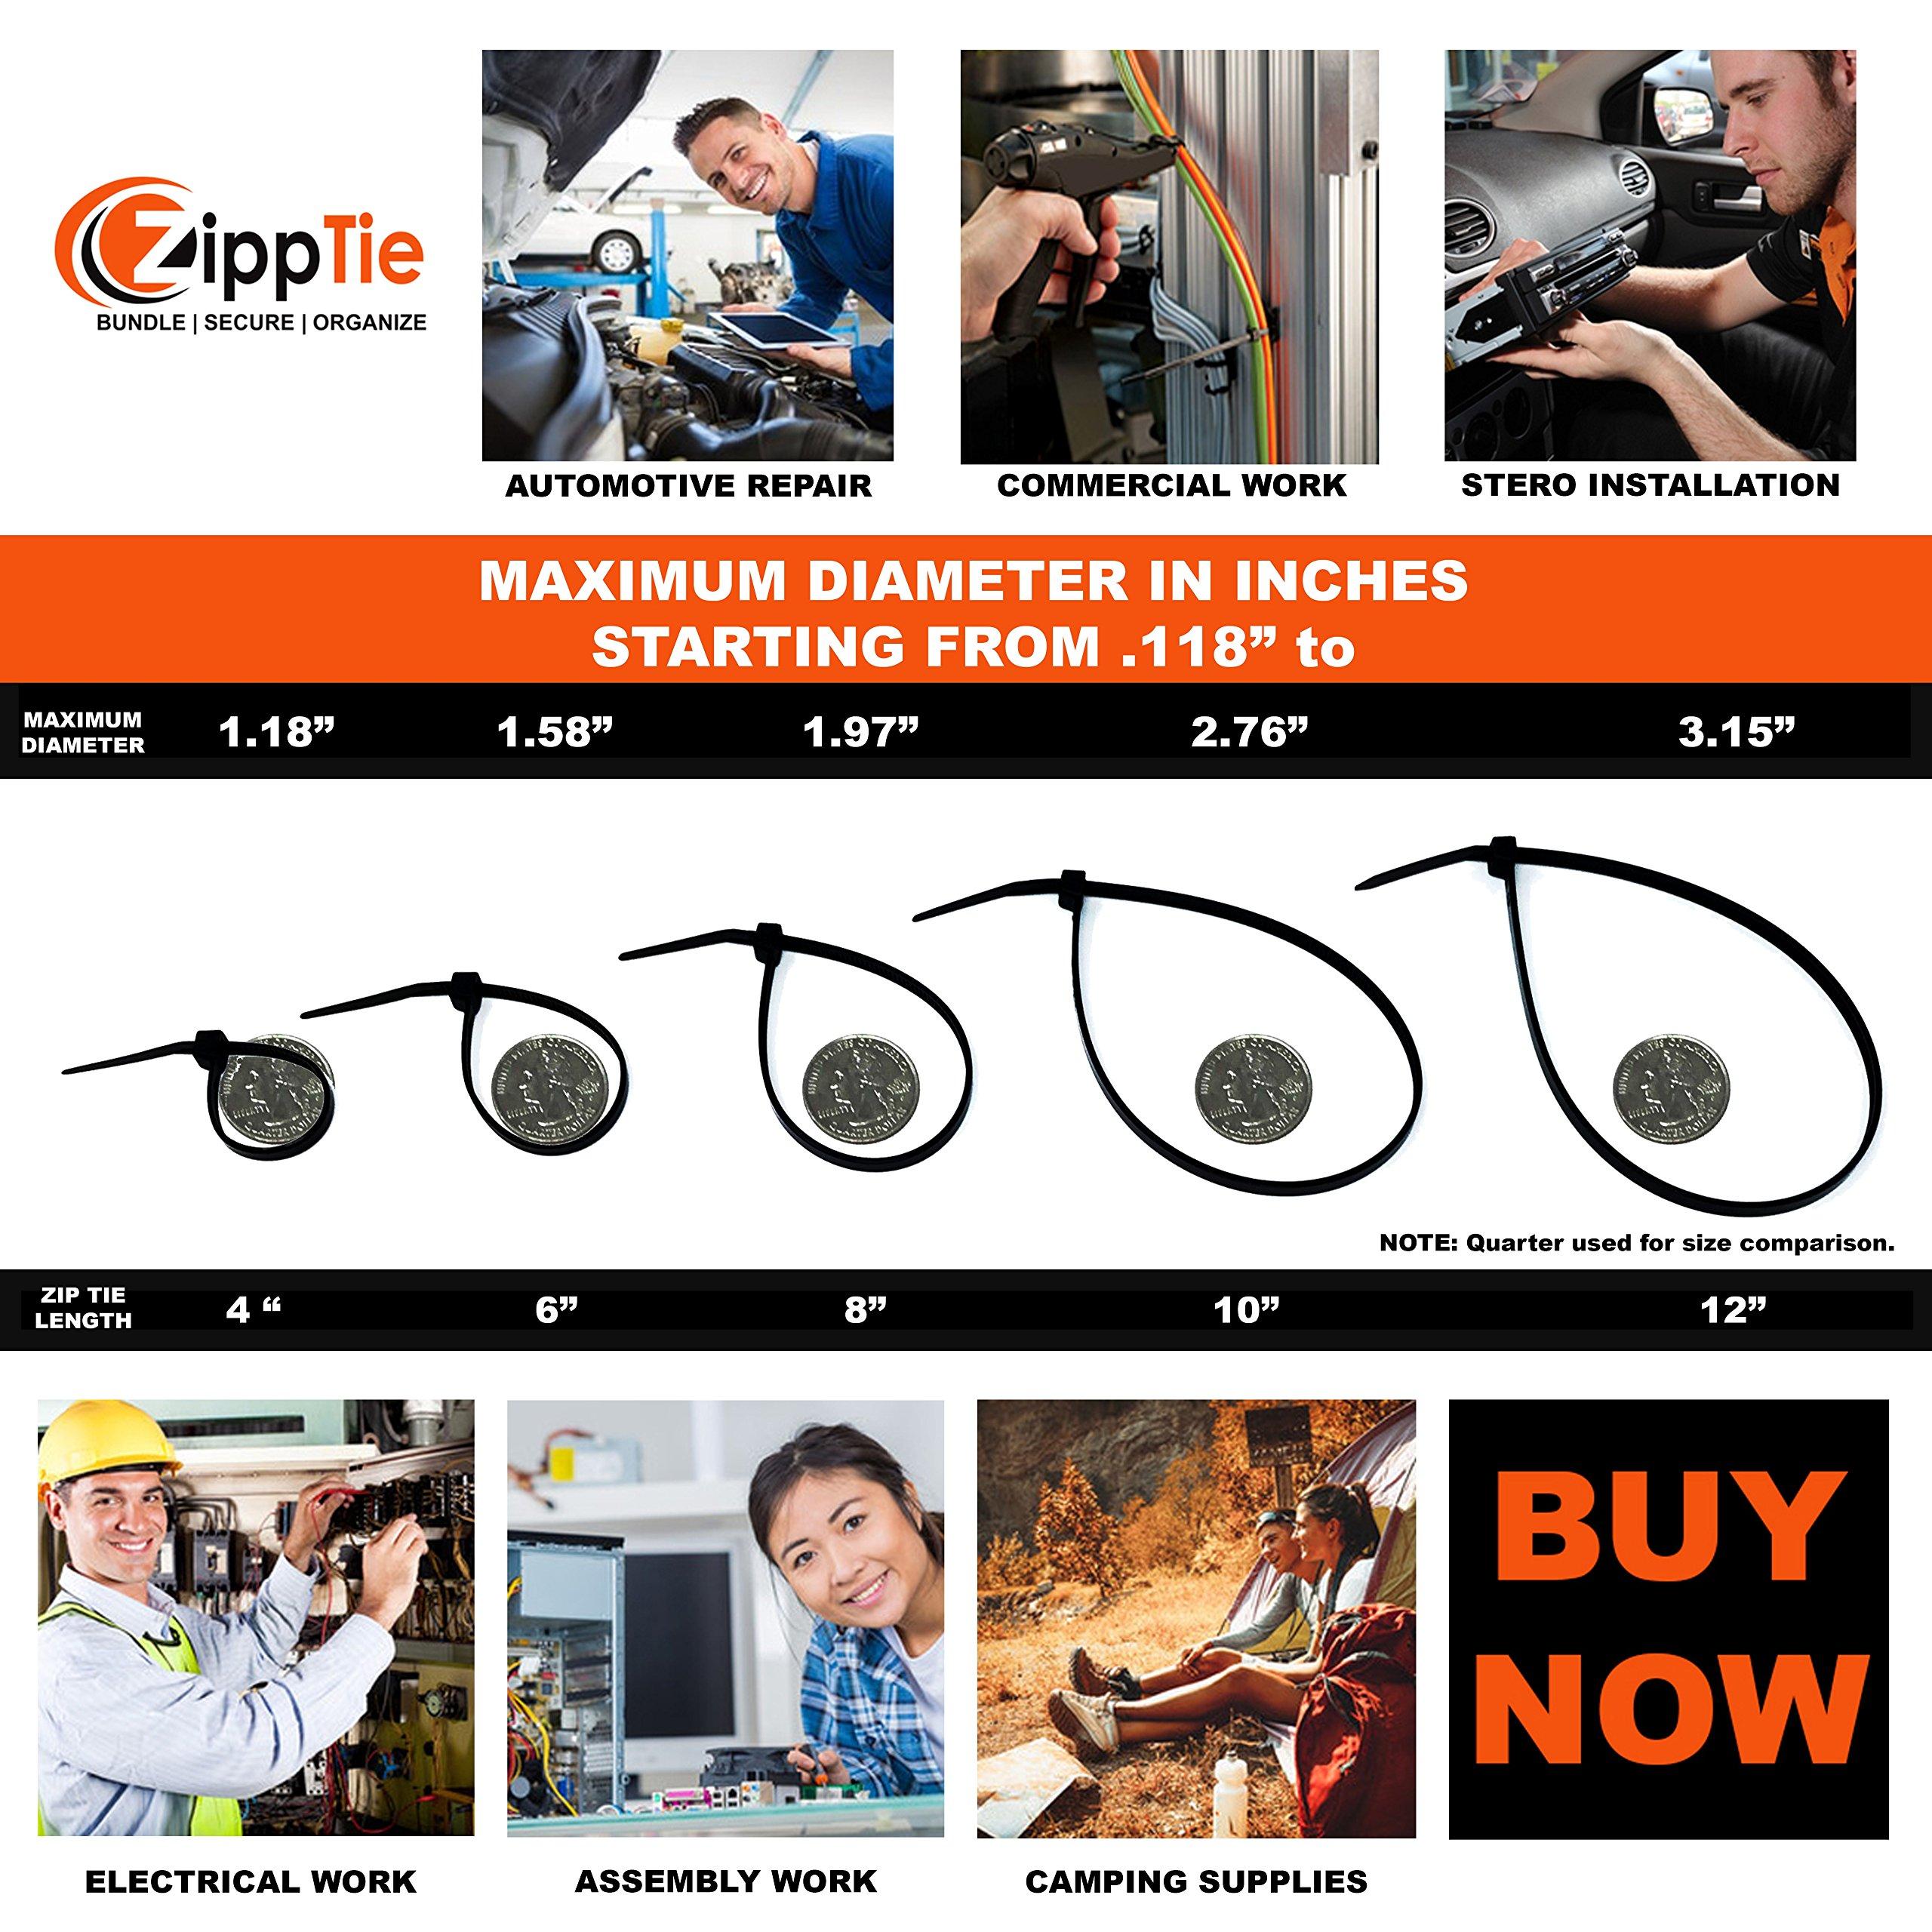 Cable Ties by ZippTie | 225pc Cable Management Kit 6'', 8'', 12'' White & UV Black Heavy Duty (Zip Ties) 50lb & 75lb | Includes 20 Adhesive Base Mounts and 5 Reusable ZippCro Wraps by ZippTie Bundle | Secure | Organize (Image #5)